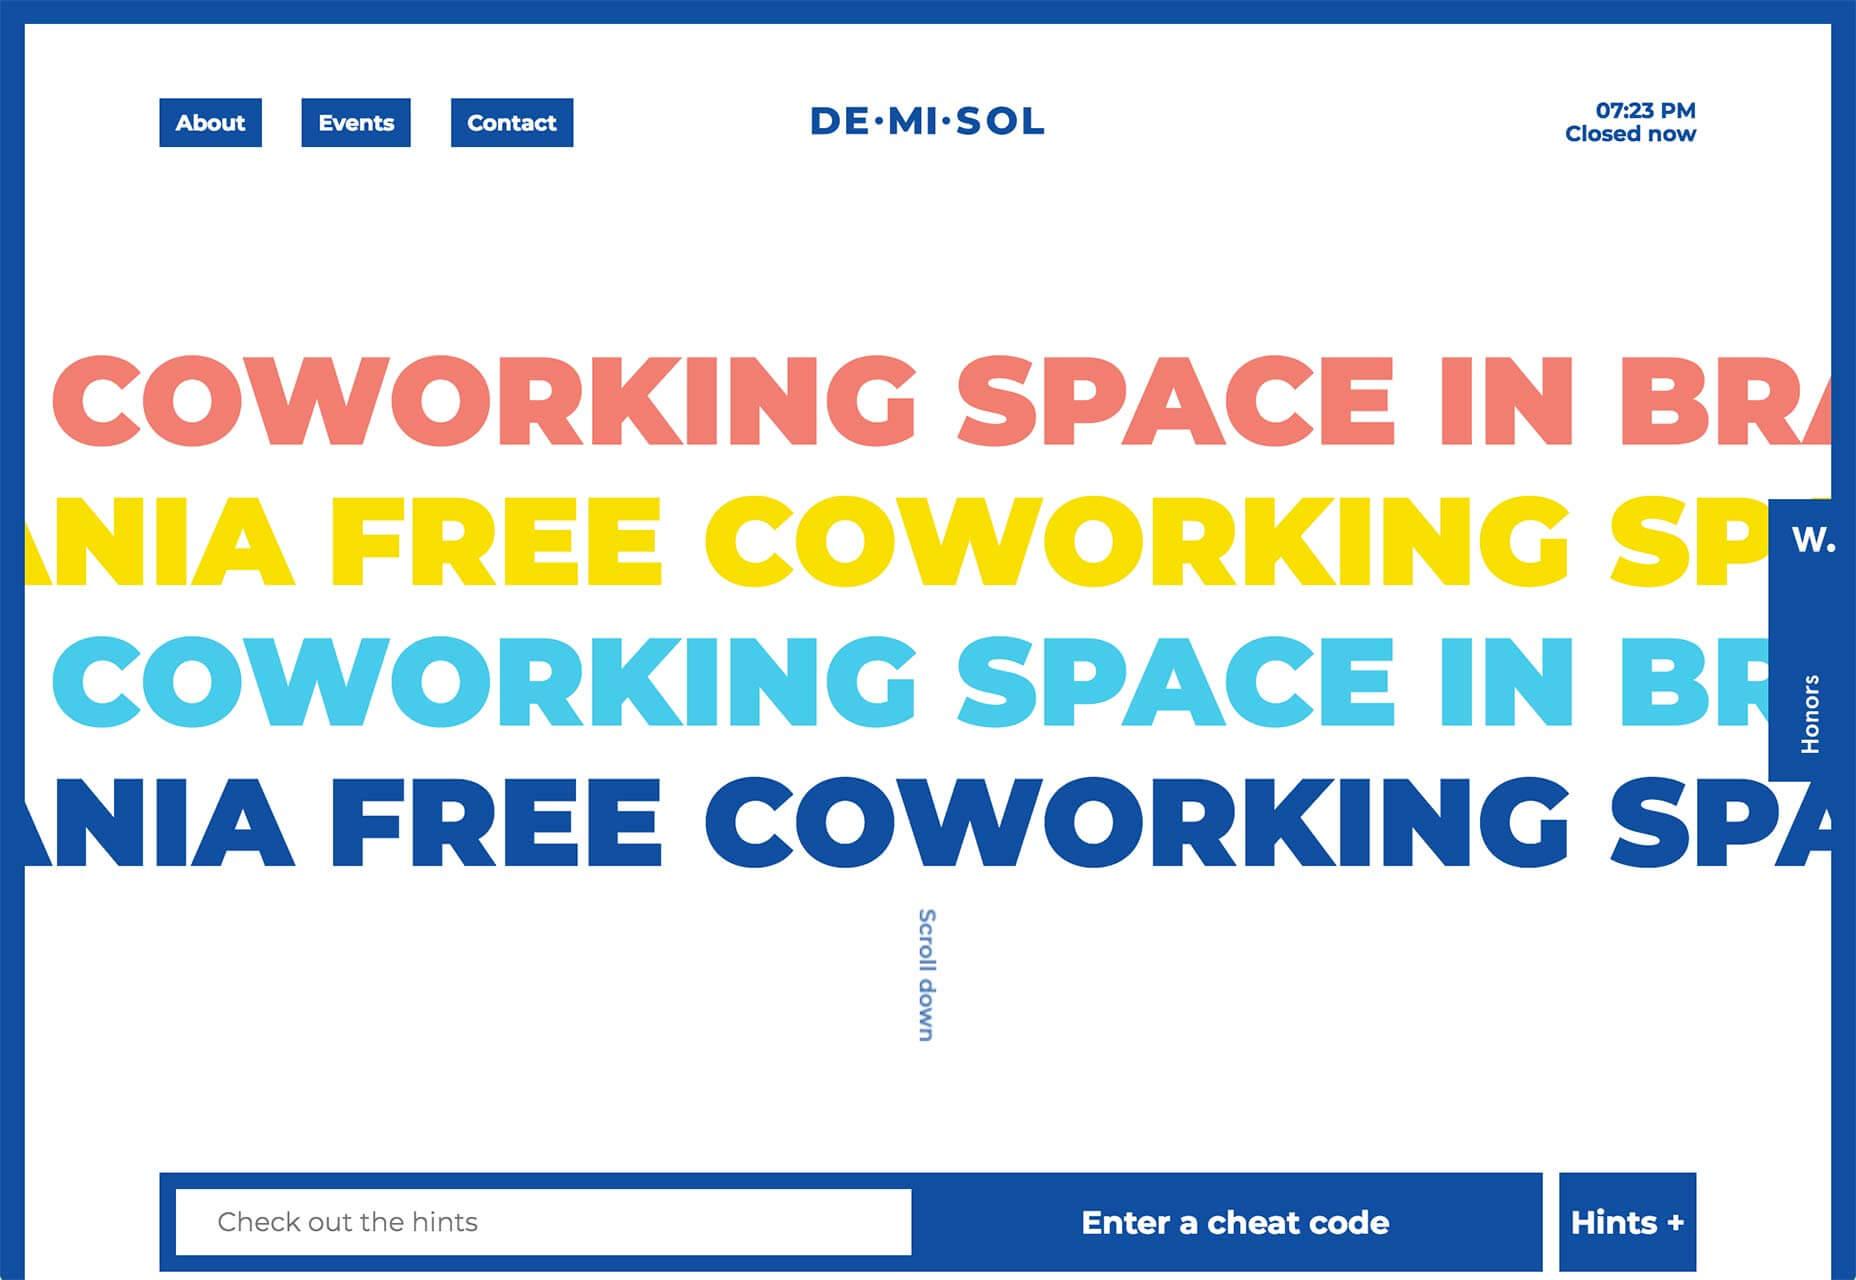 13_demisol website